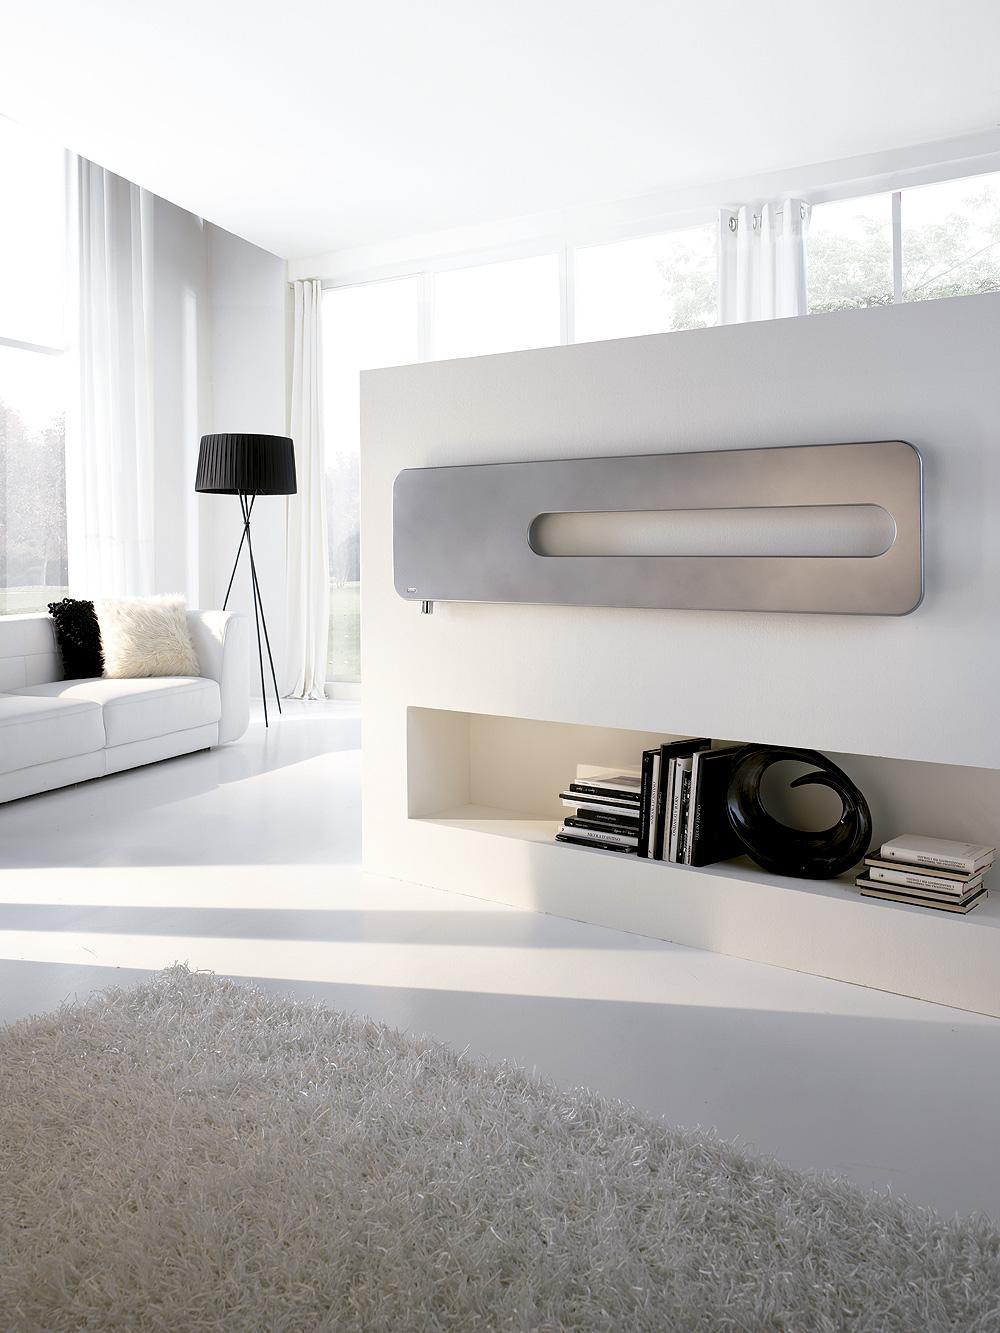 radiadores extra slim baxi design by cordivari (2)